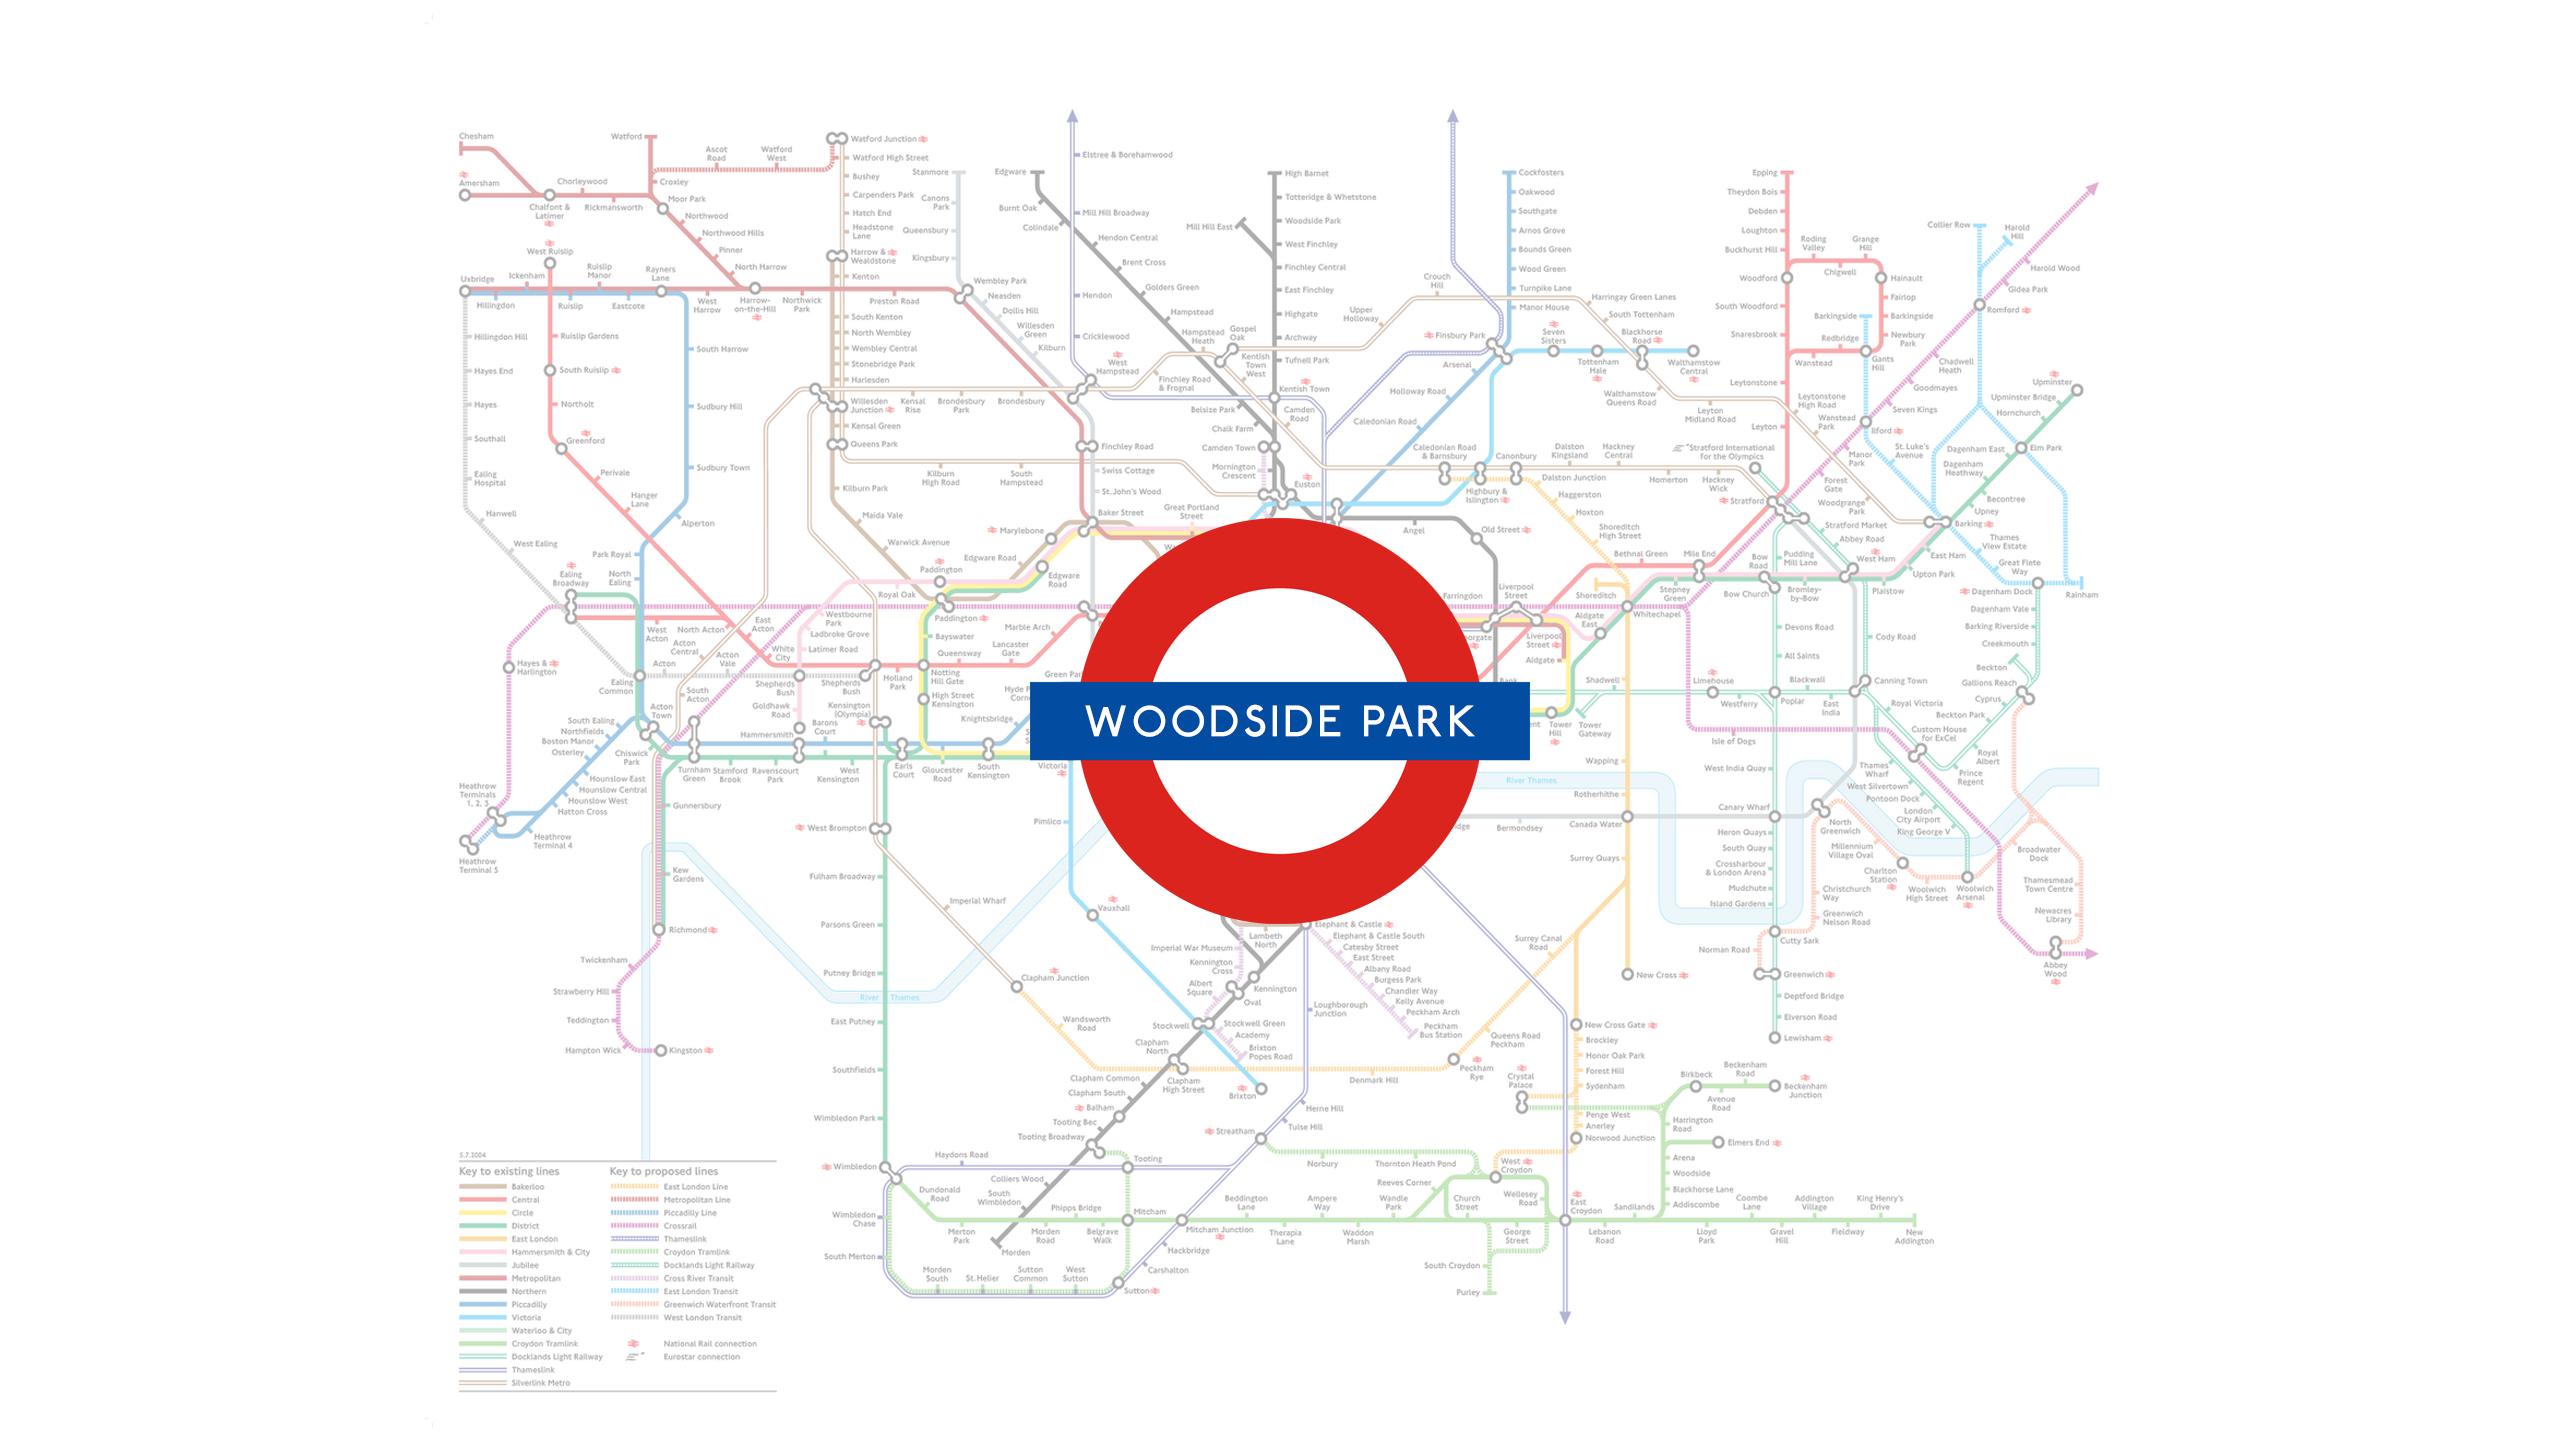 Woodside Park (Map)